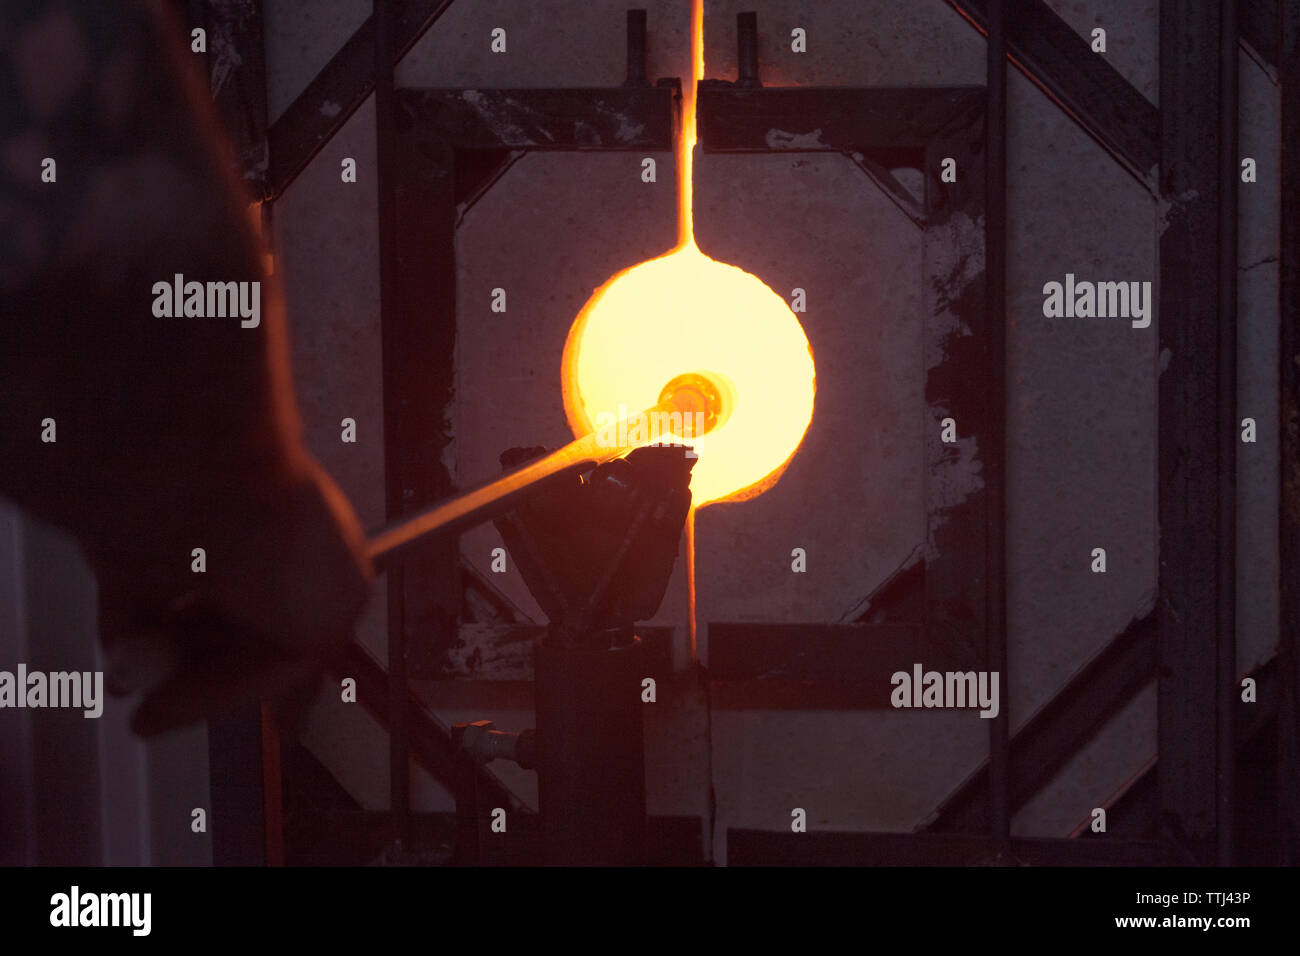 Souffleur De Verre Ile De Ré furnace glass photos & furnace glass images - alamy